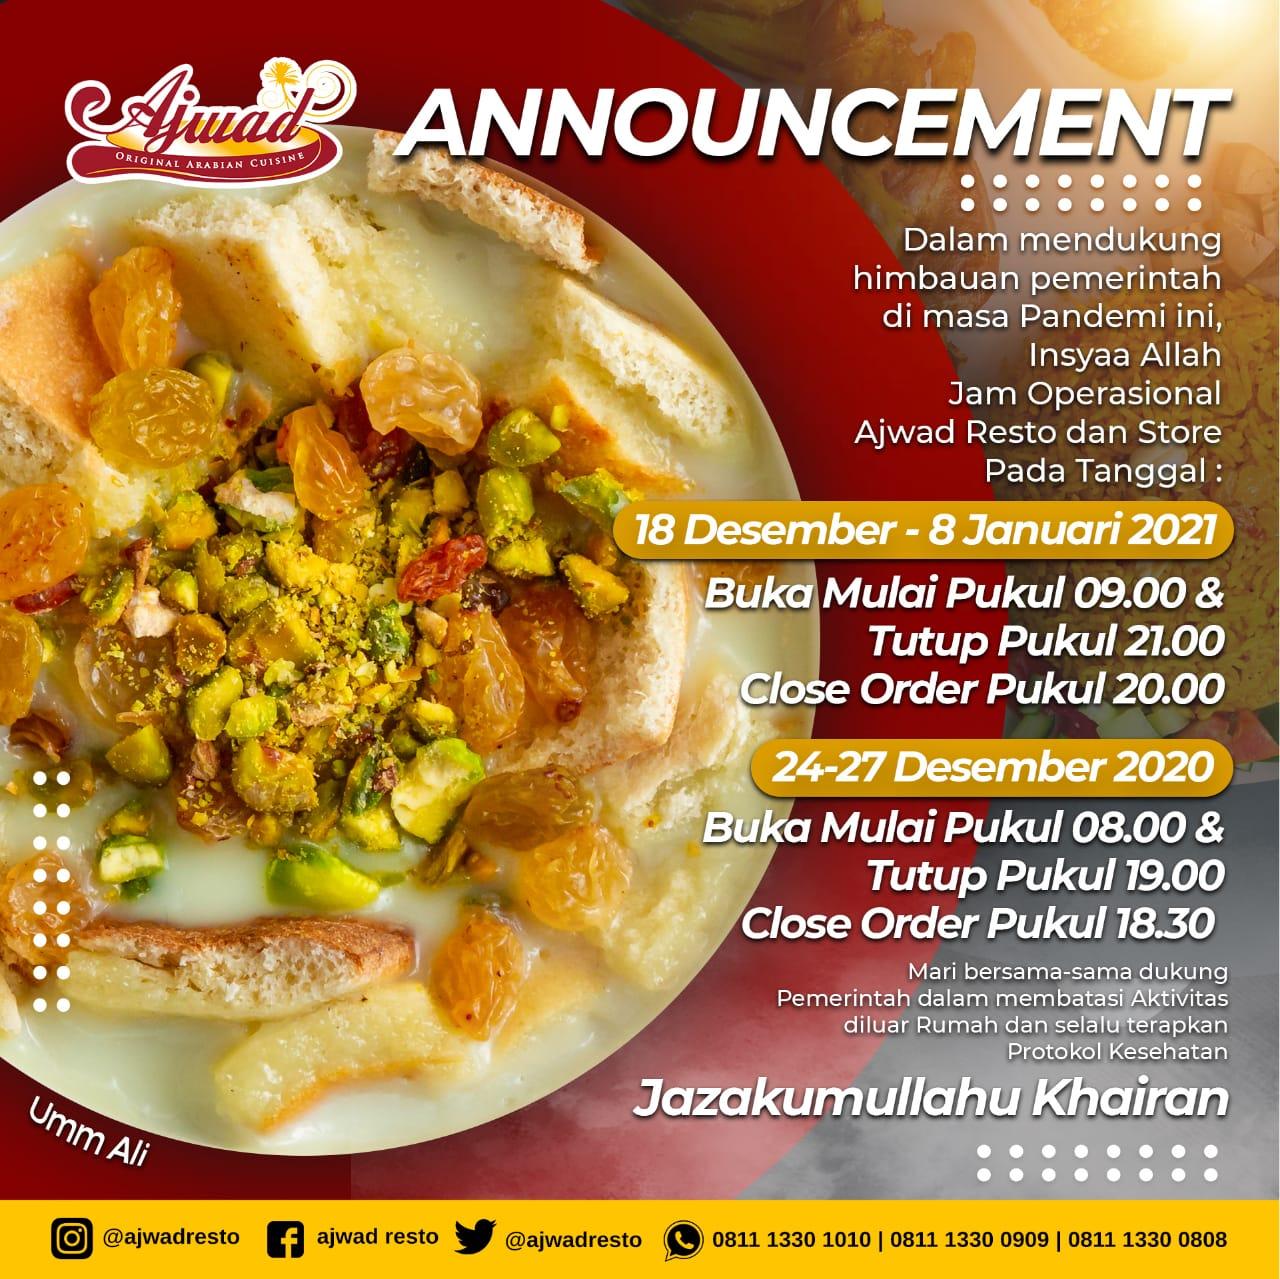 Announcement !! Informasi Jam Operasional Ajwad Resto dan Ajwad Store